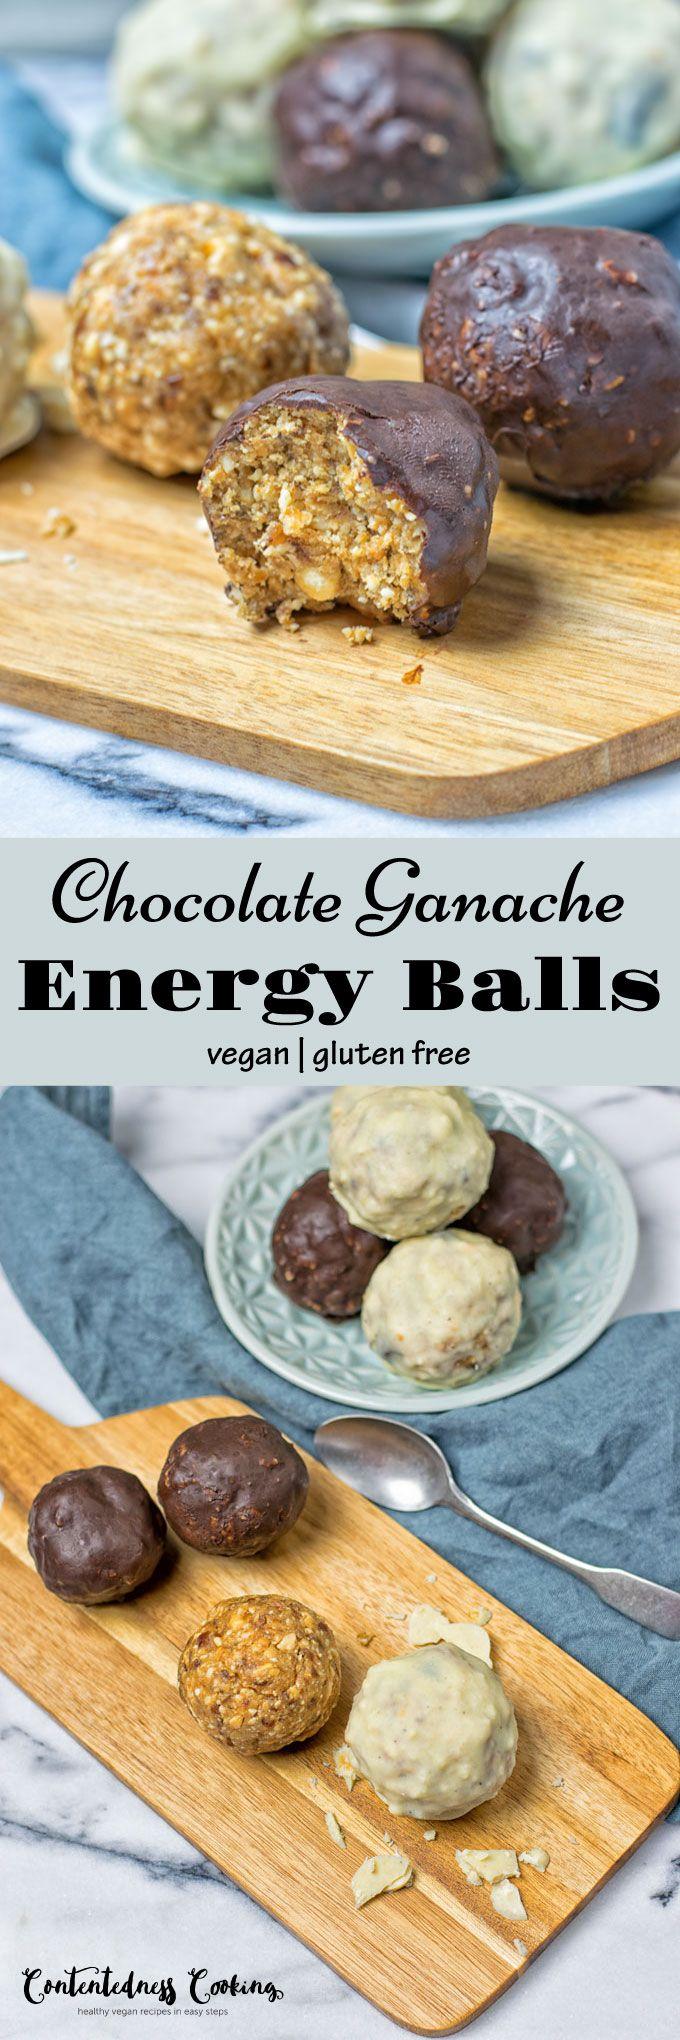 Chocolate Ganache Energy Balls | #vegan #glutenfree #contentednesscooking